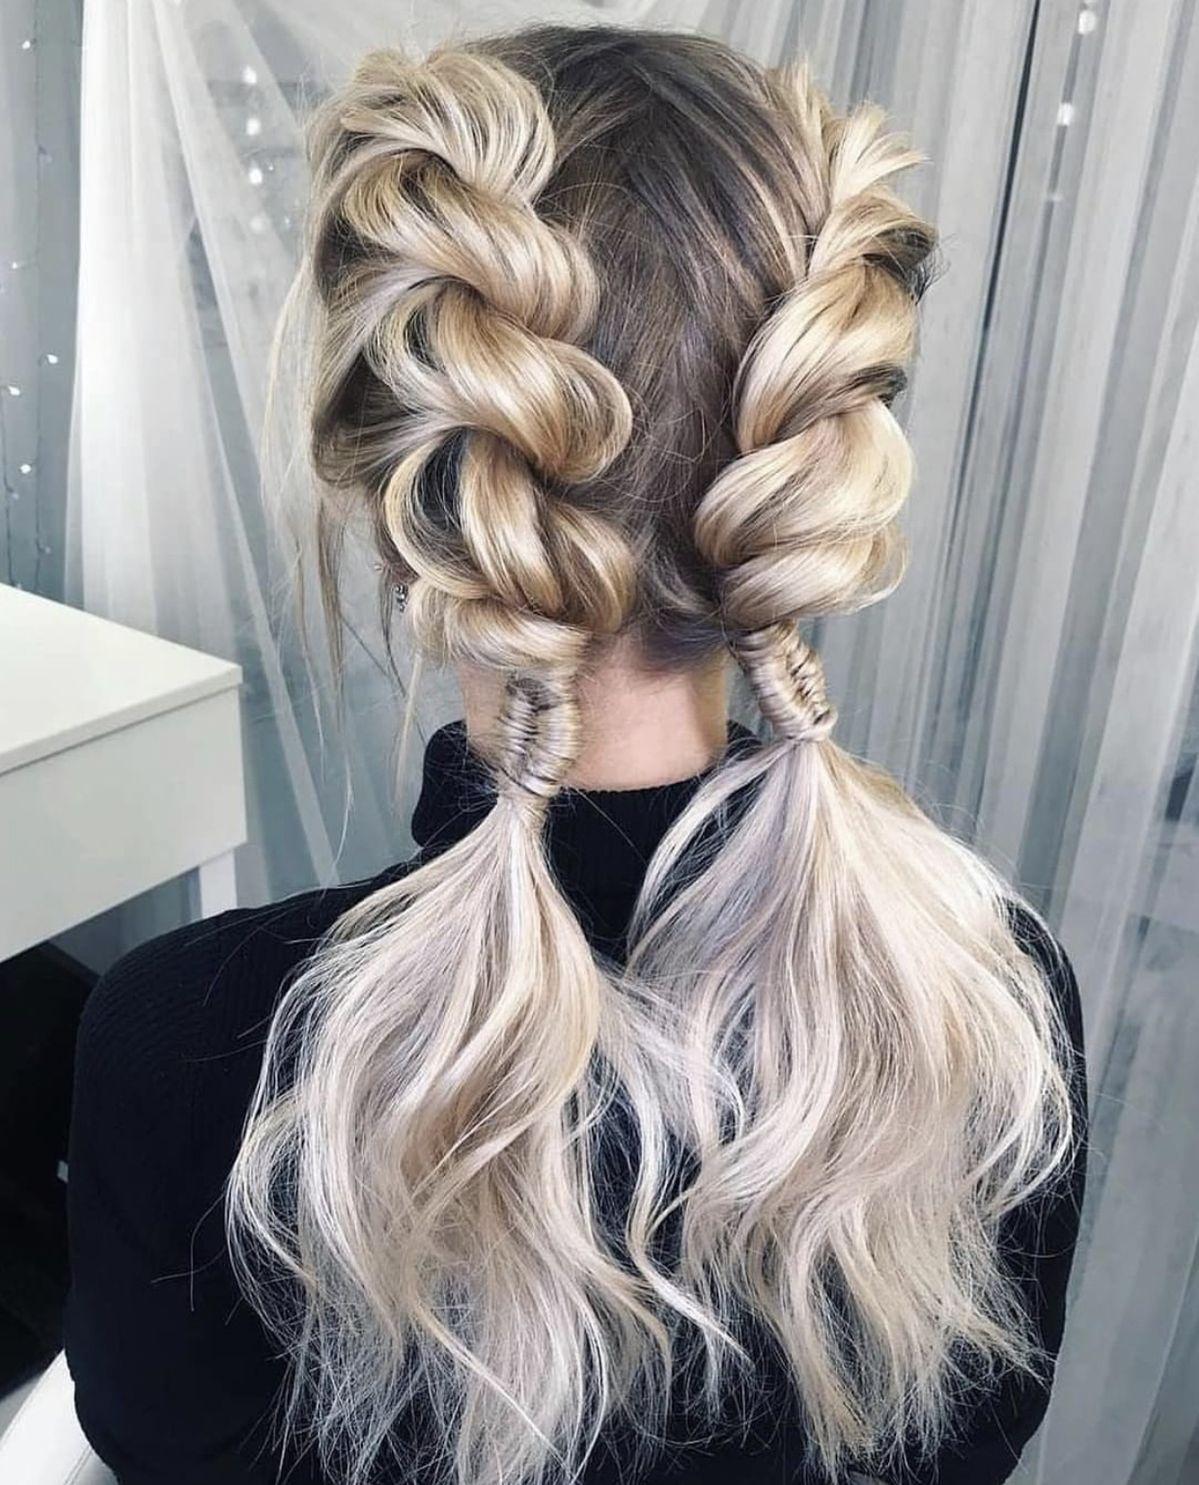 Hair Inspiration 2019-05-08 04:47:36